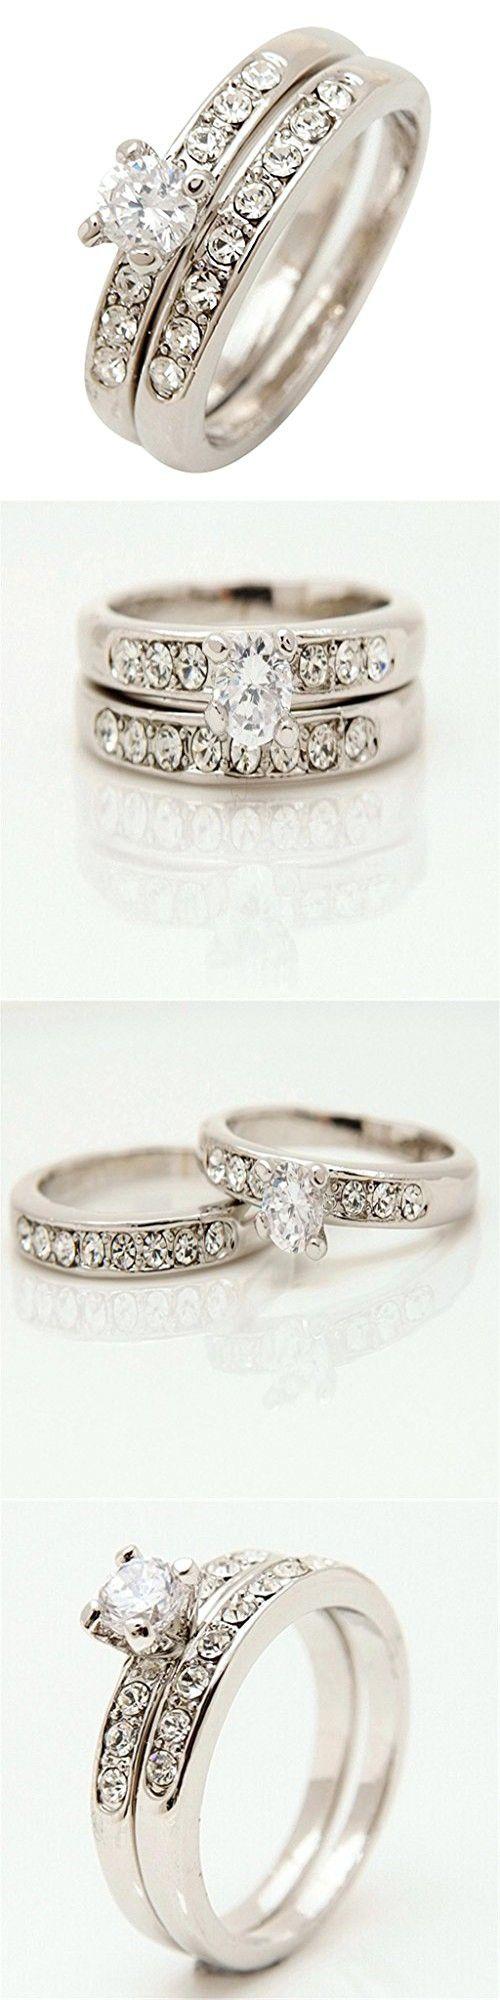 Followmoon Platinum Plated Use Cubic Zirconia Crystal Engagement Wedding  Ring Set For Women